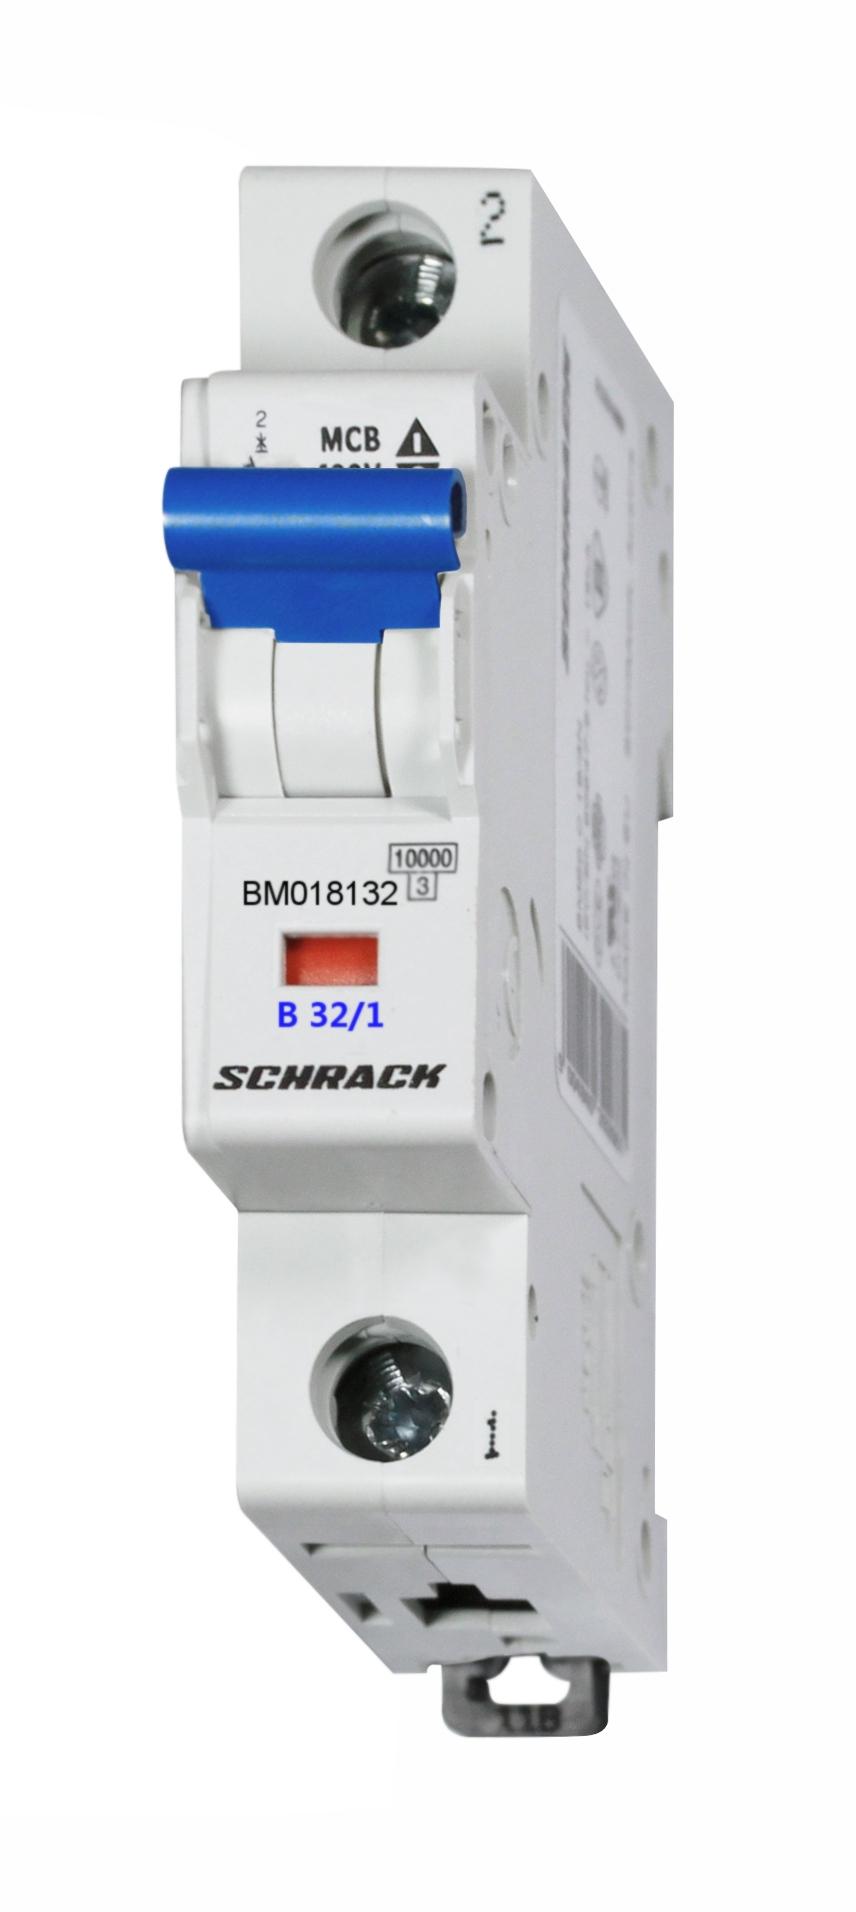 BM018132 - Schrack Technik